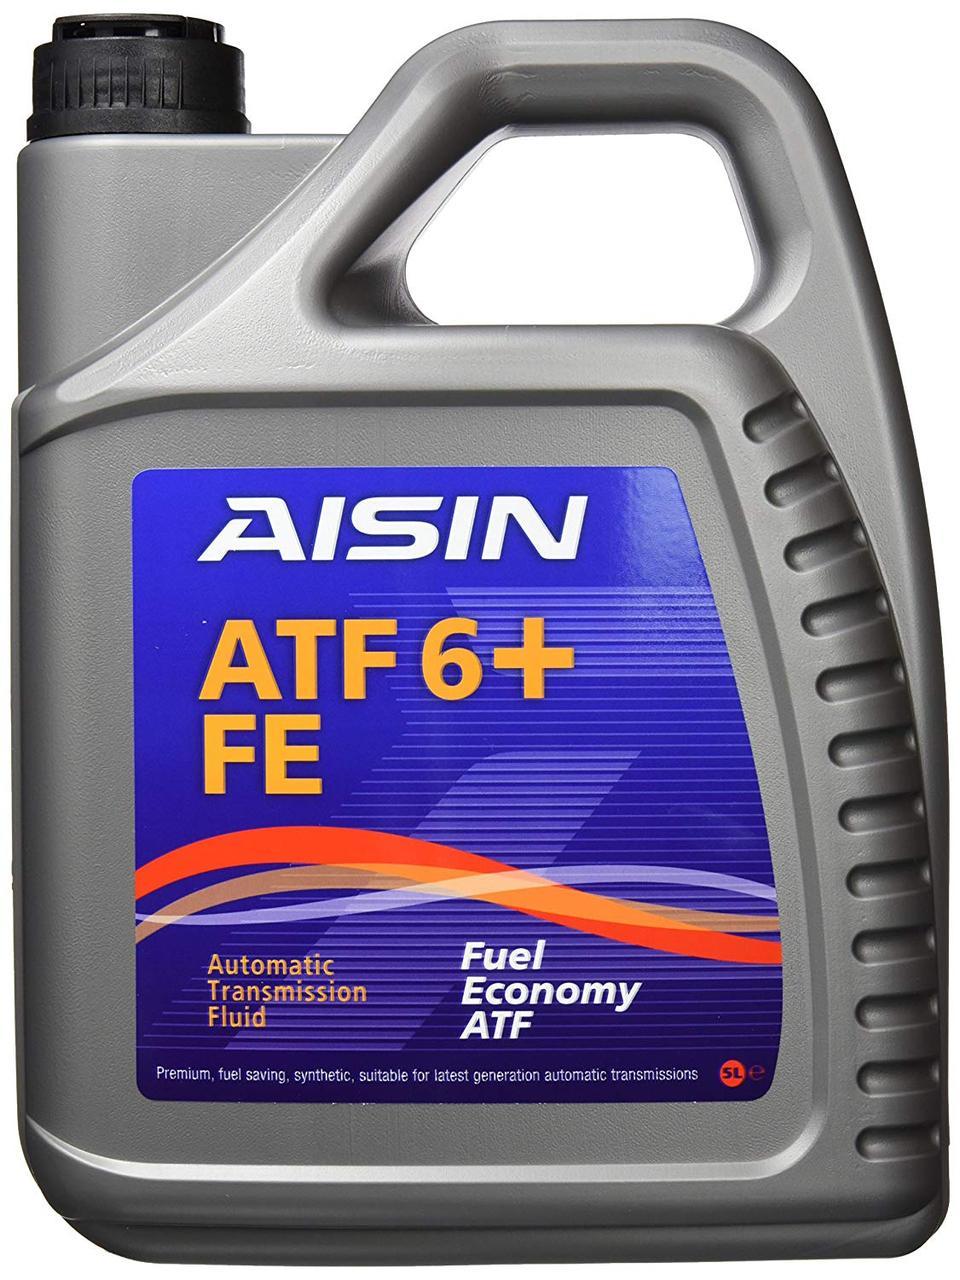 Масло трансмісійне ATF 6+, 5л AISIN ATF91005